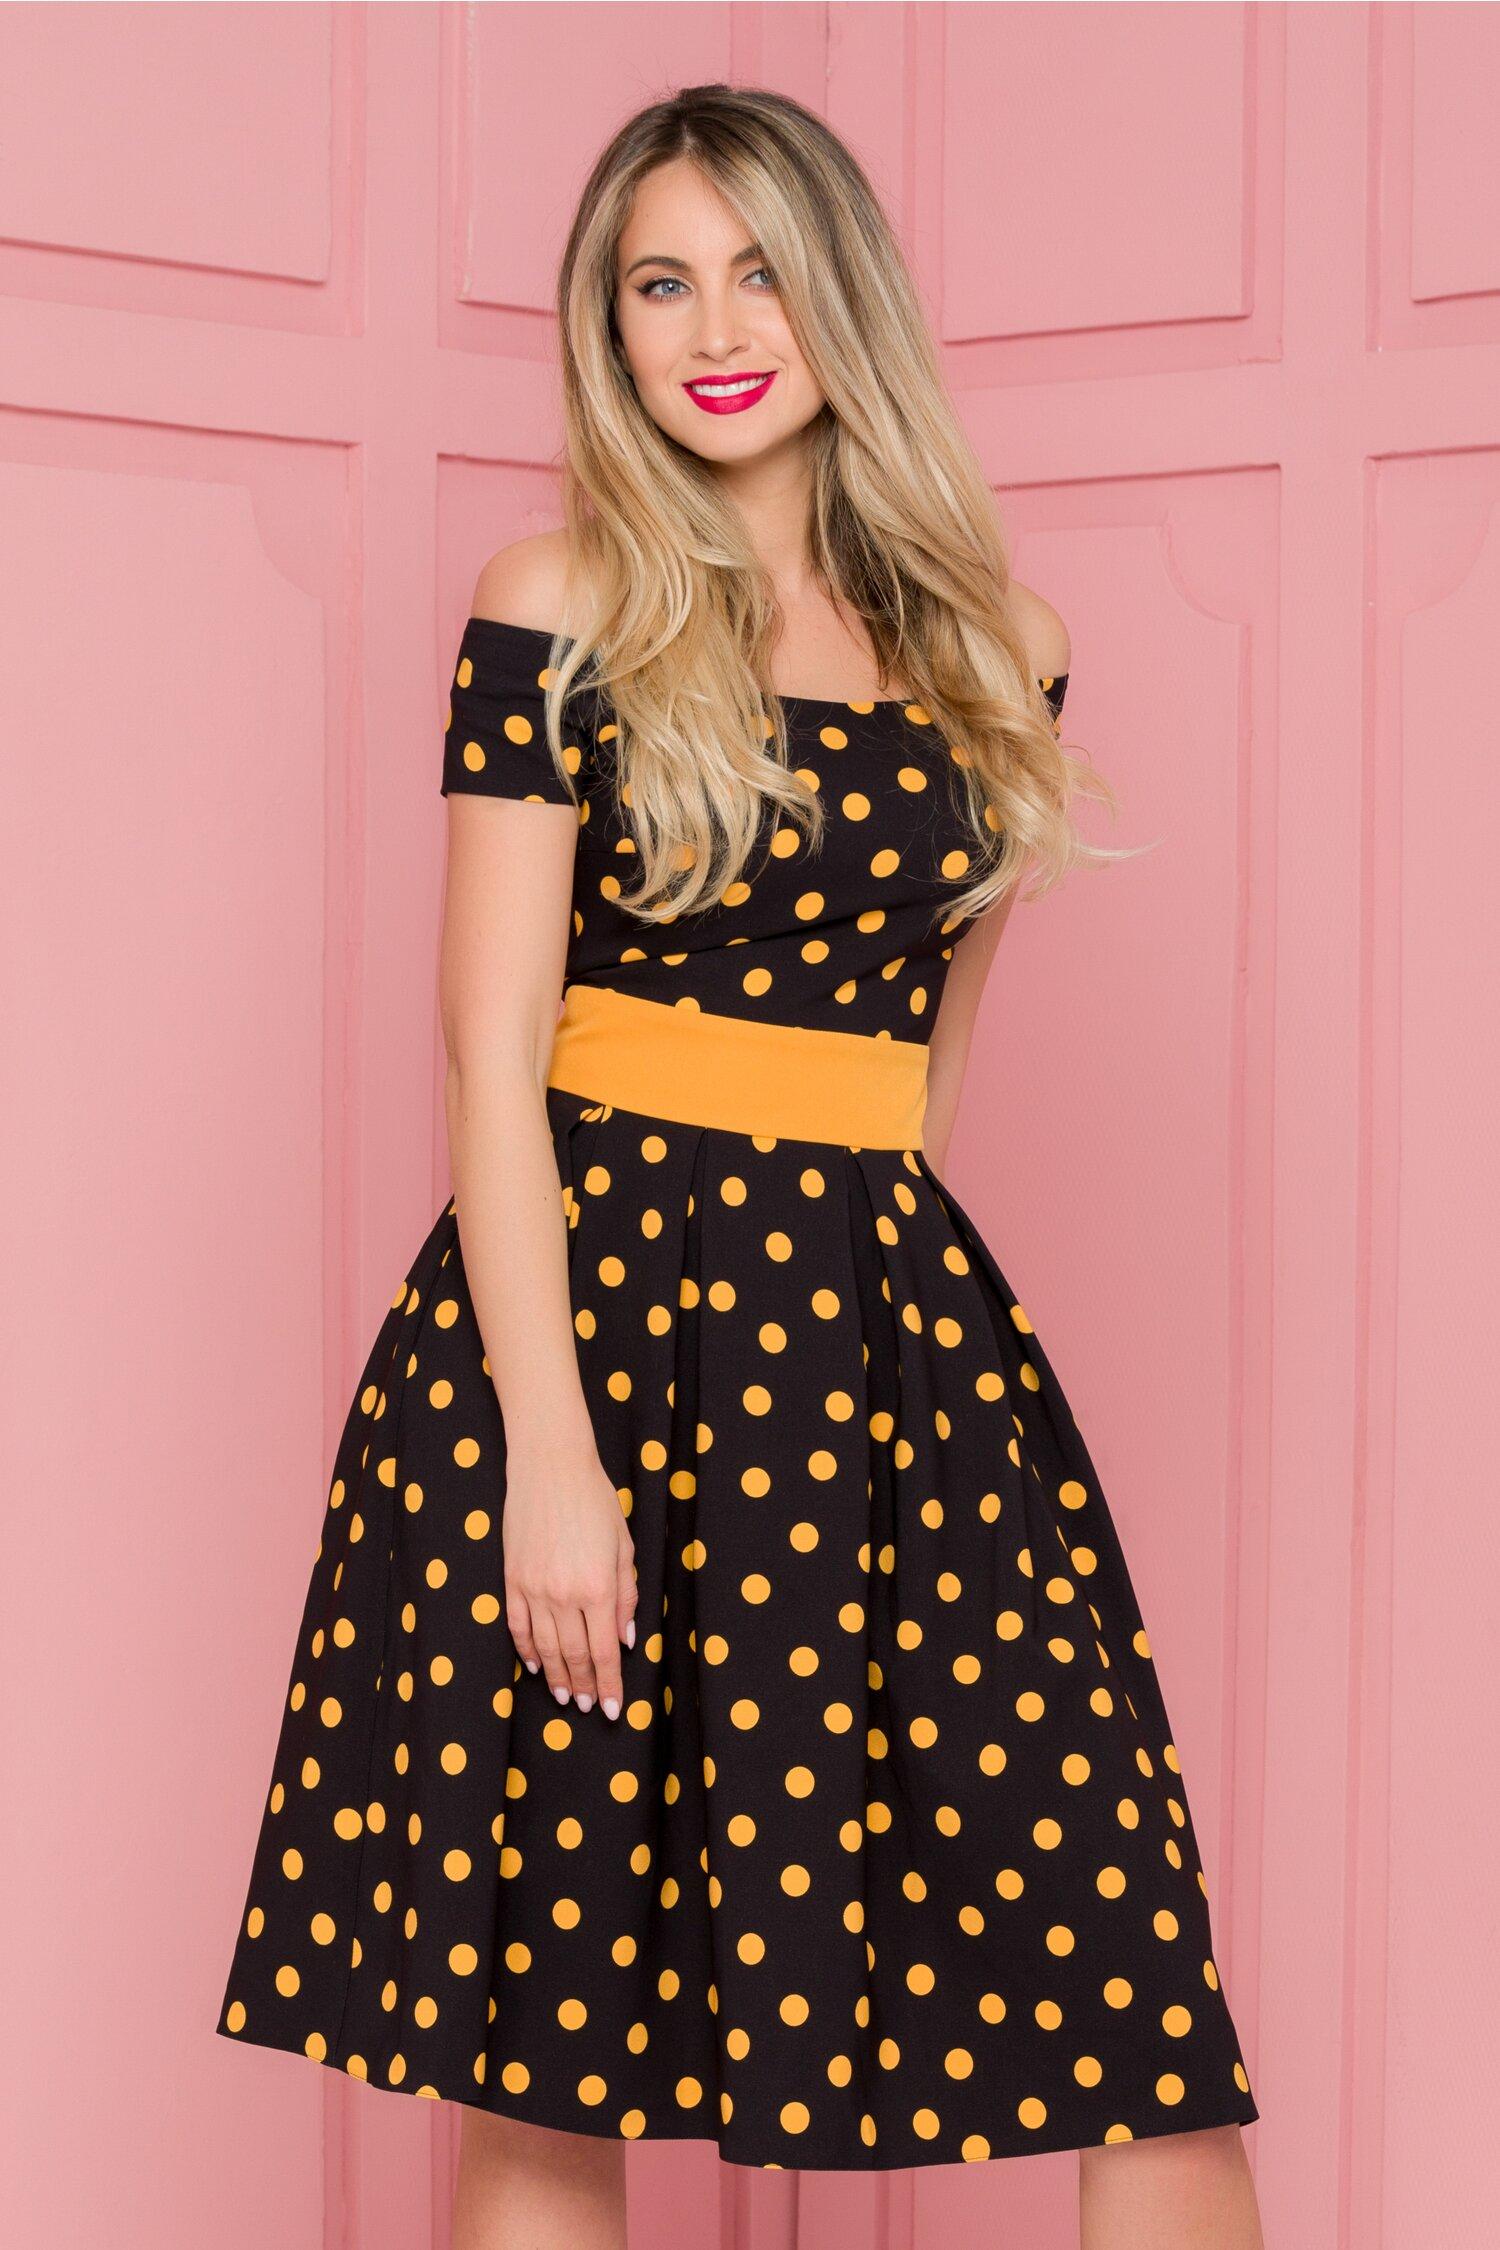 Rochie LaDonna neagra imprimata cu buline galben mustar